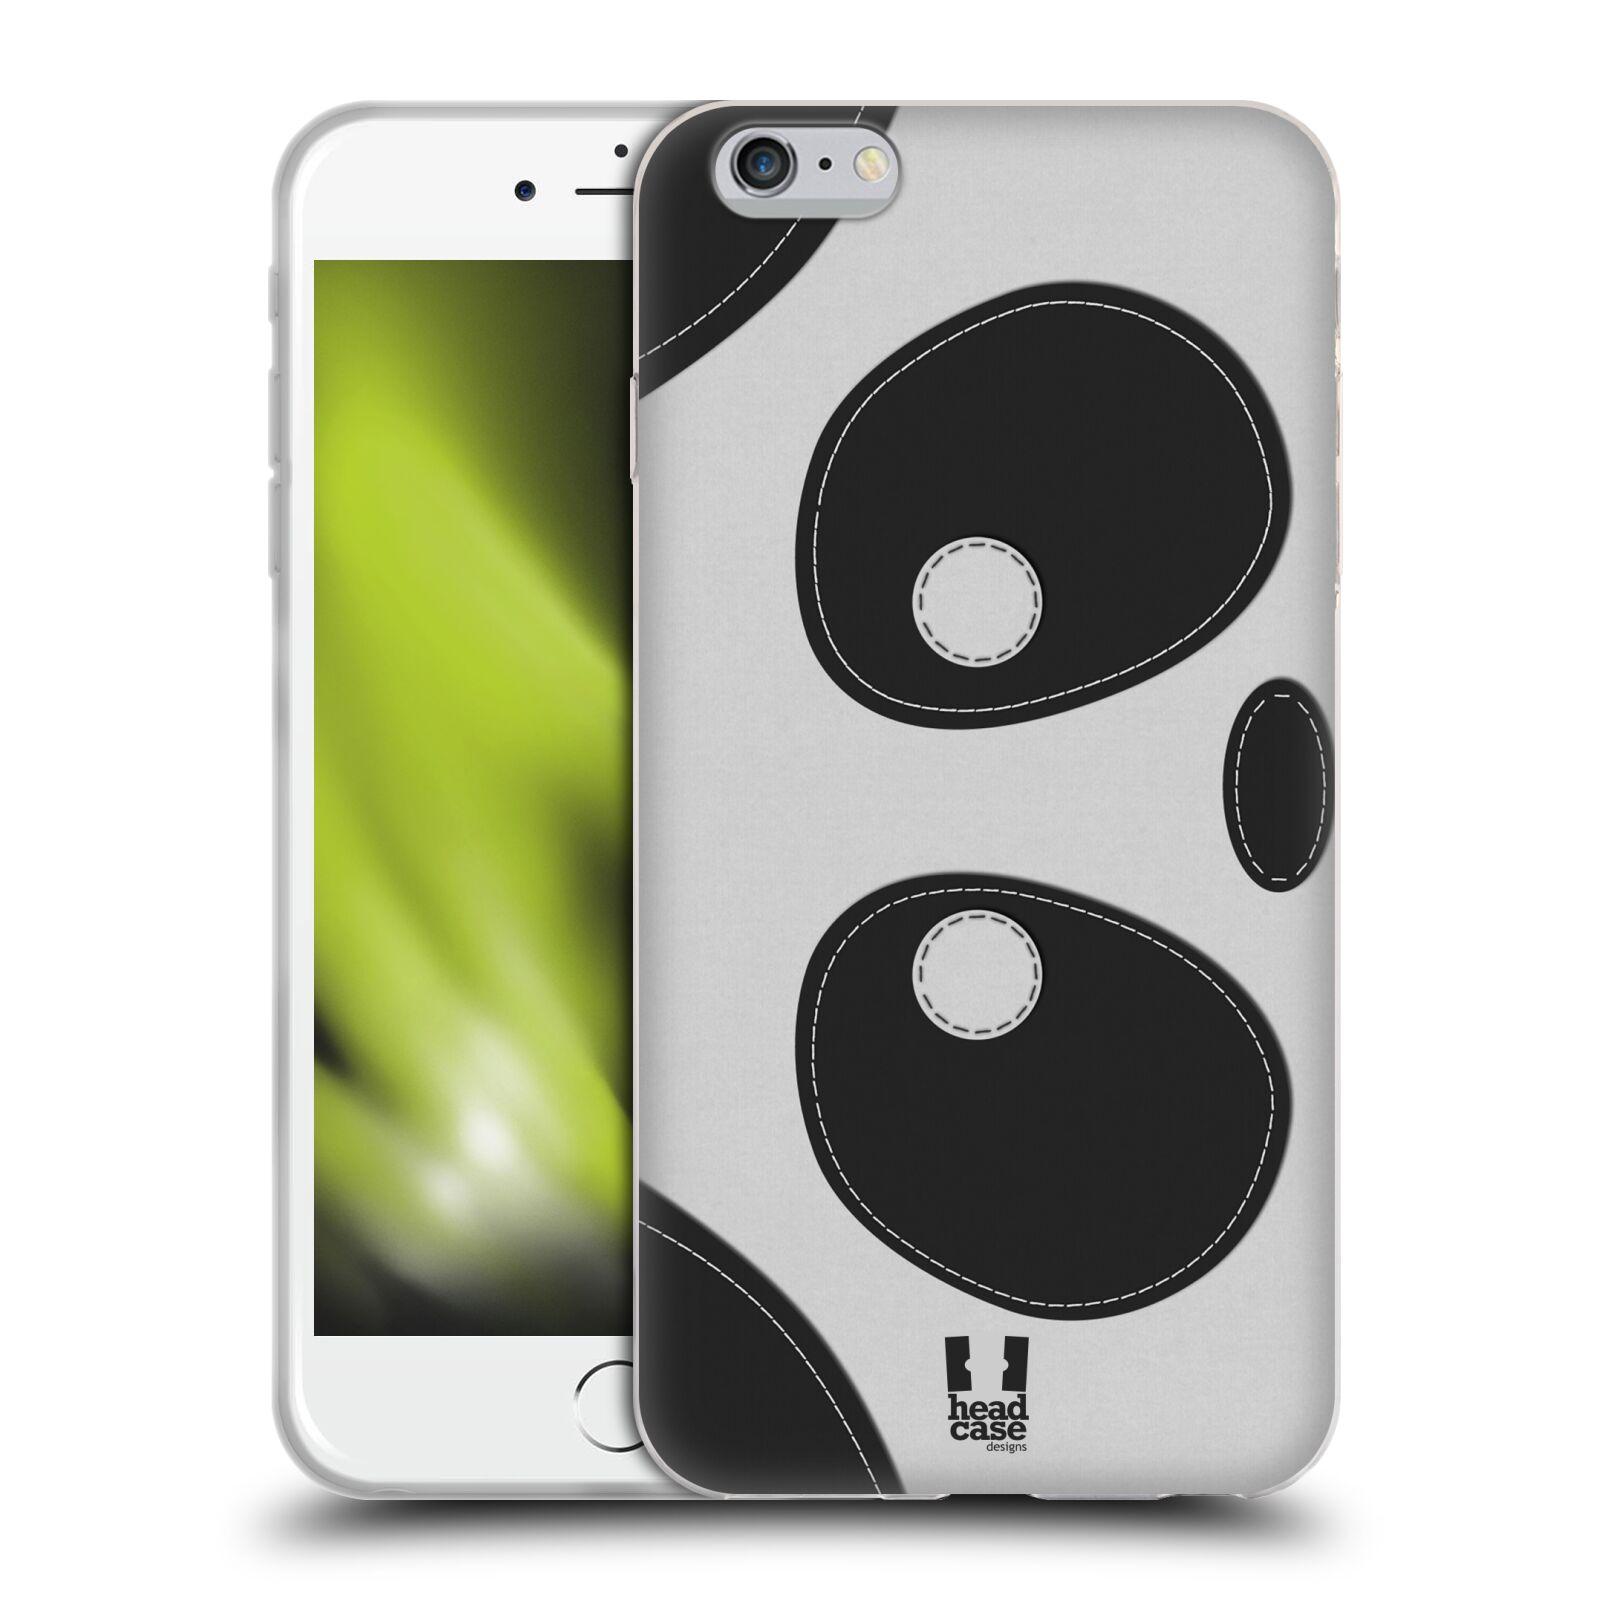 HEAD CASE silikonový obal na mobil Apple Iphone 6 PLUS/ 6S PLUS vzor zvířecí nášivka medvídek panda